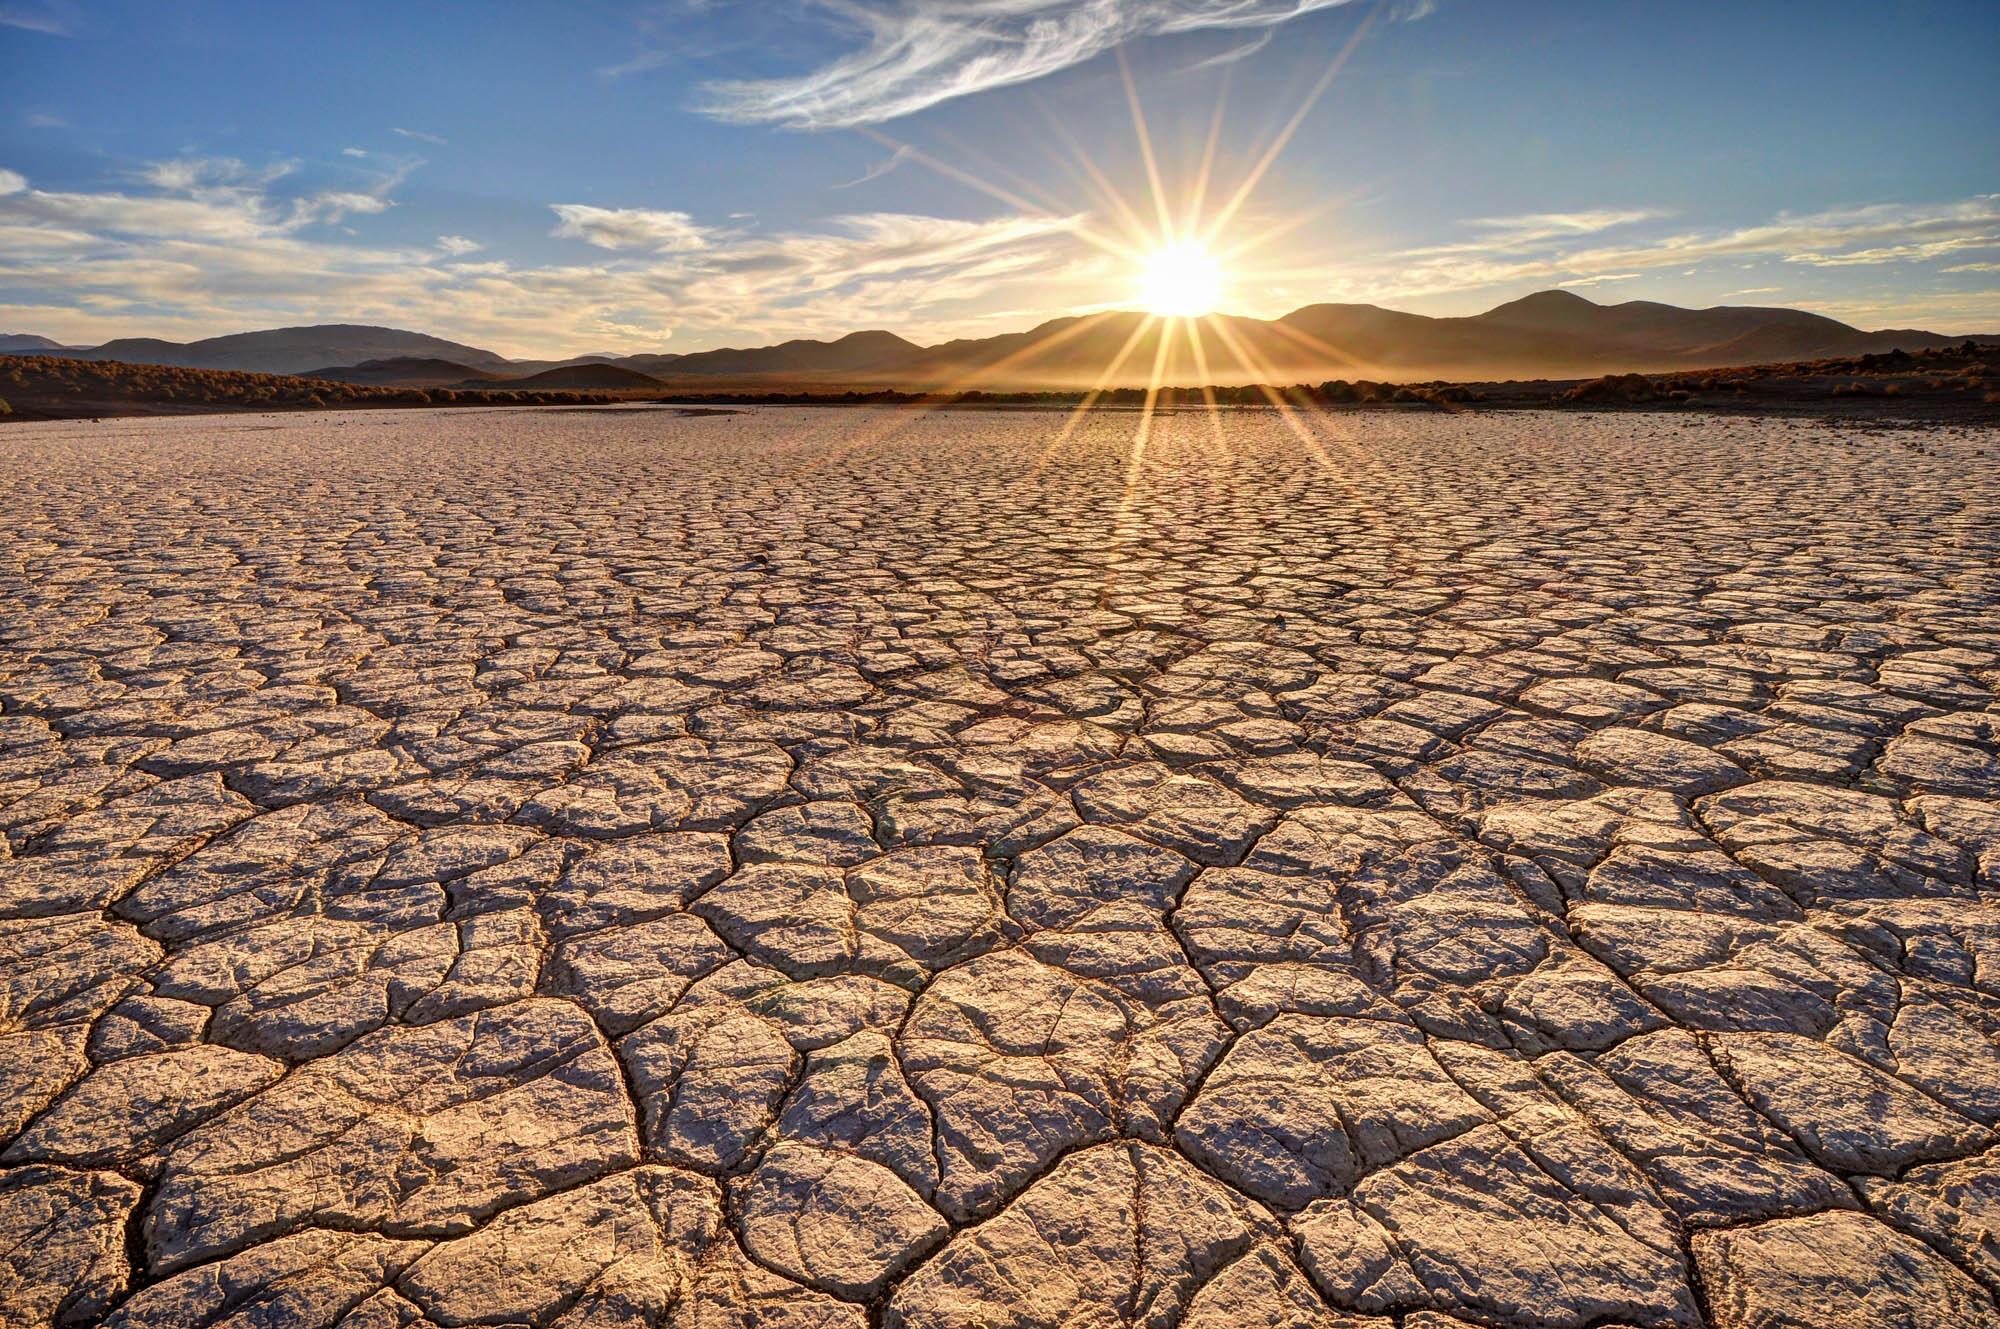 Sunrise in the Mojave Desert at Fossil Falls National Historic Site, California